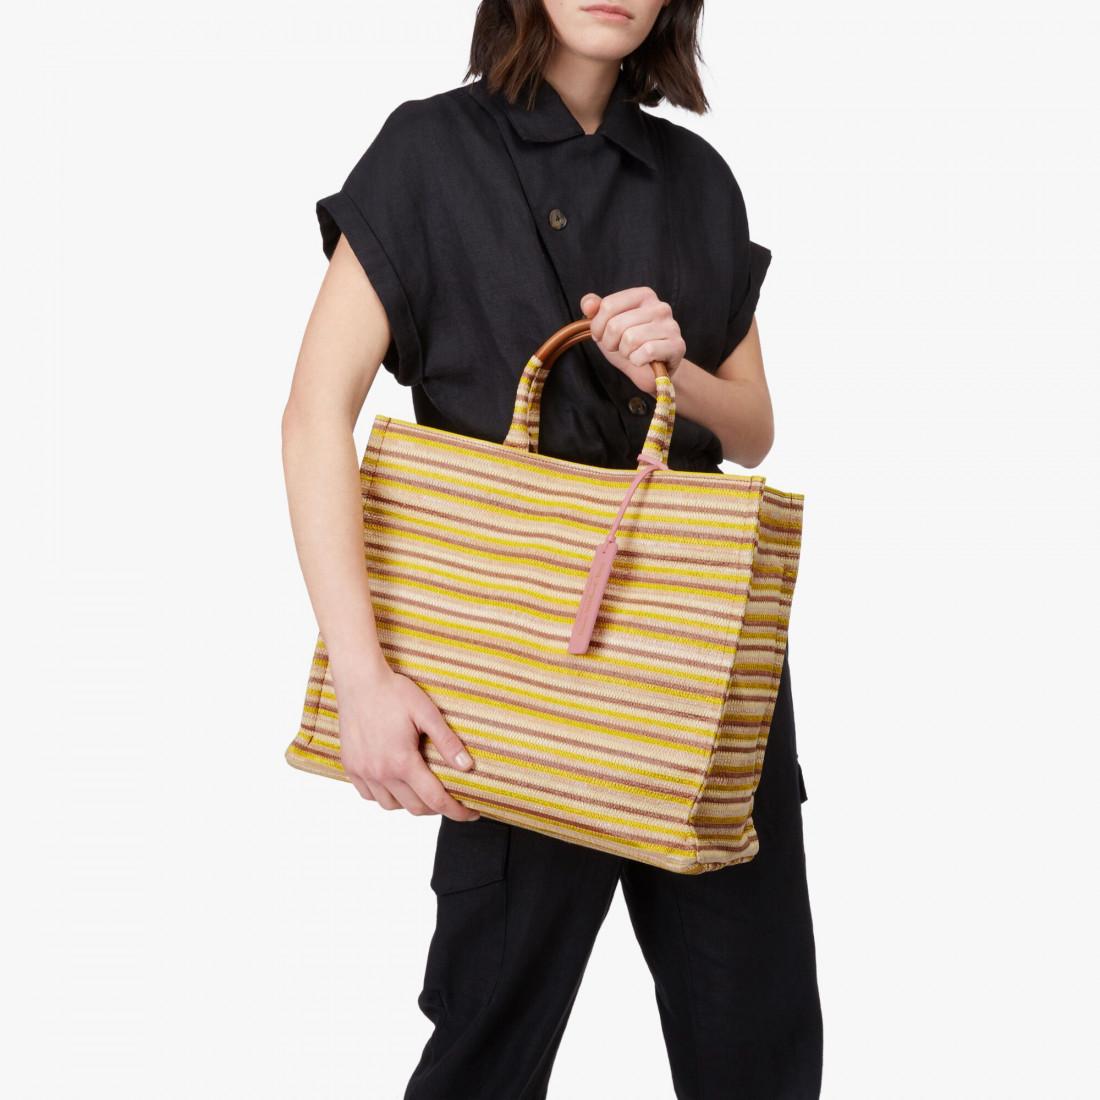 handbags woman coccinelle e1hb3180101915 8543